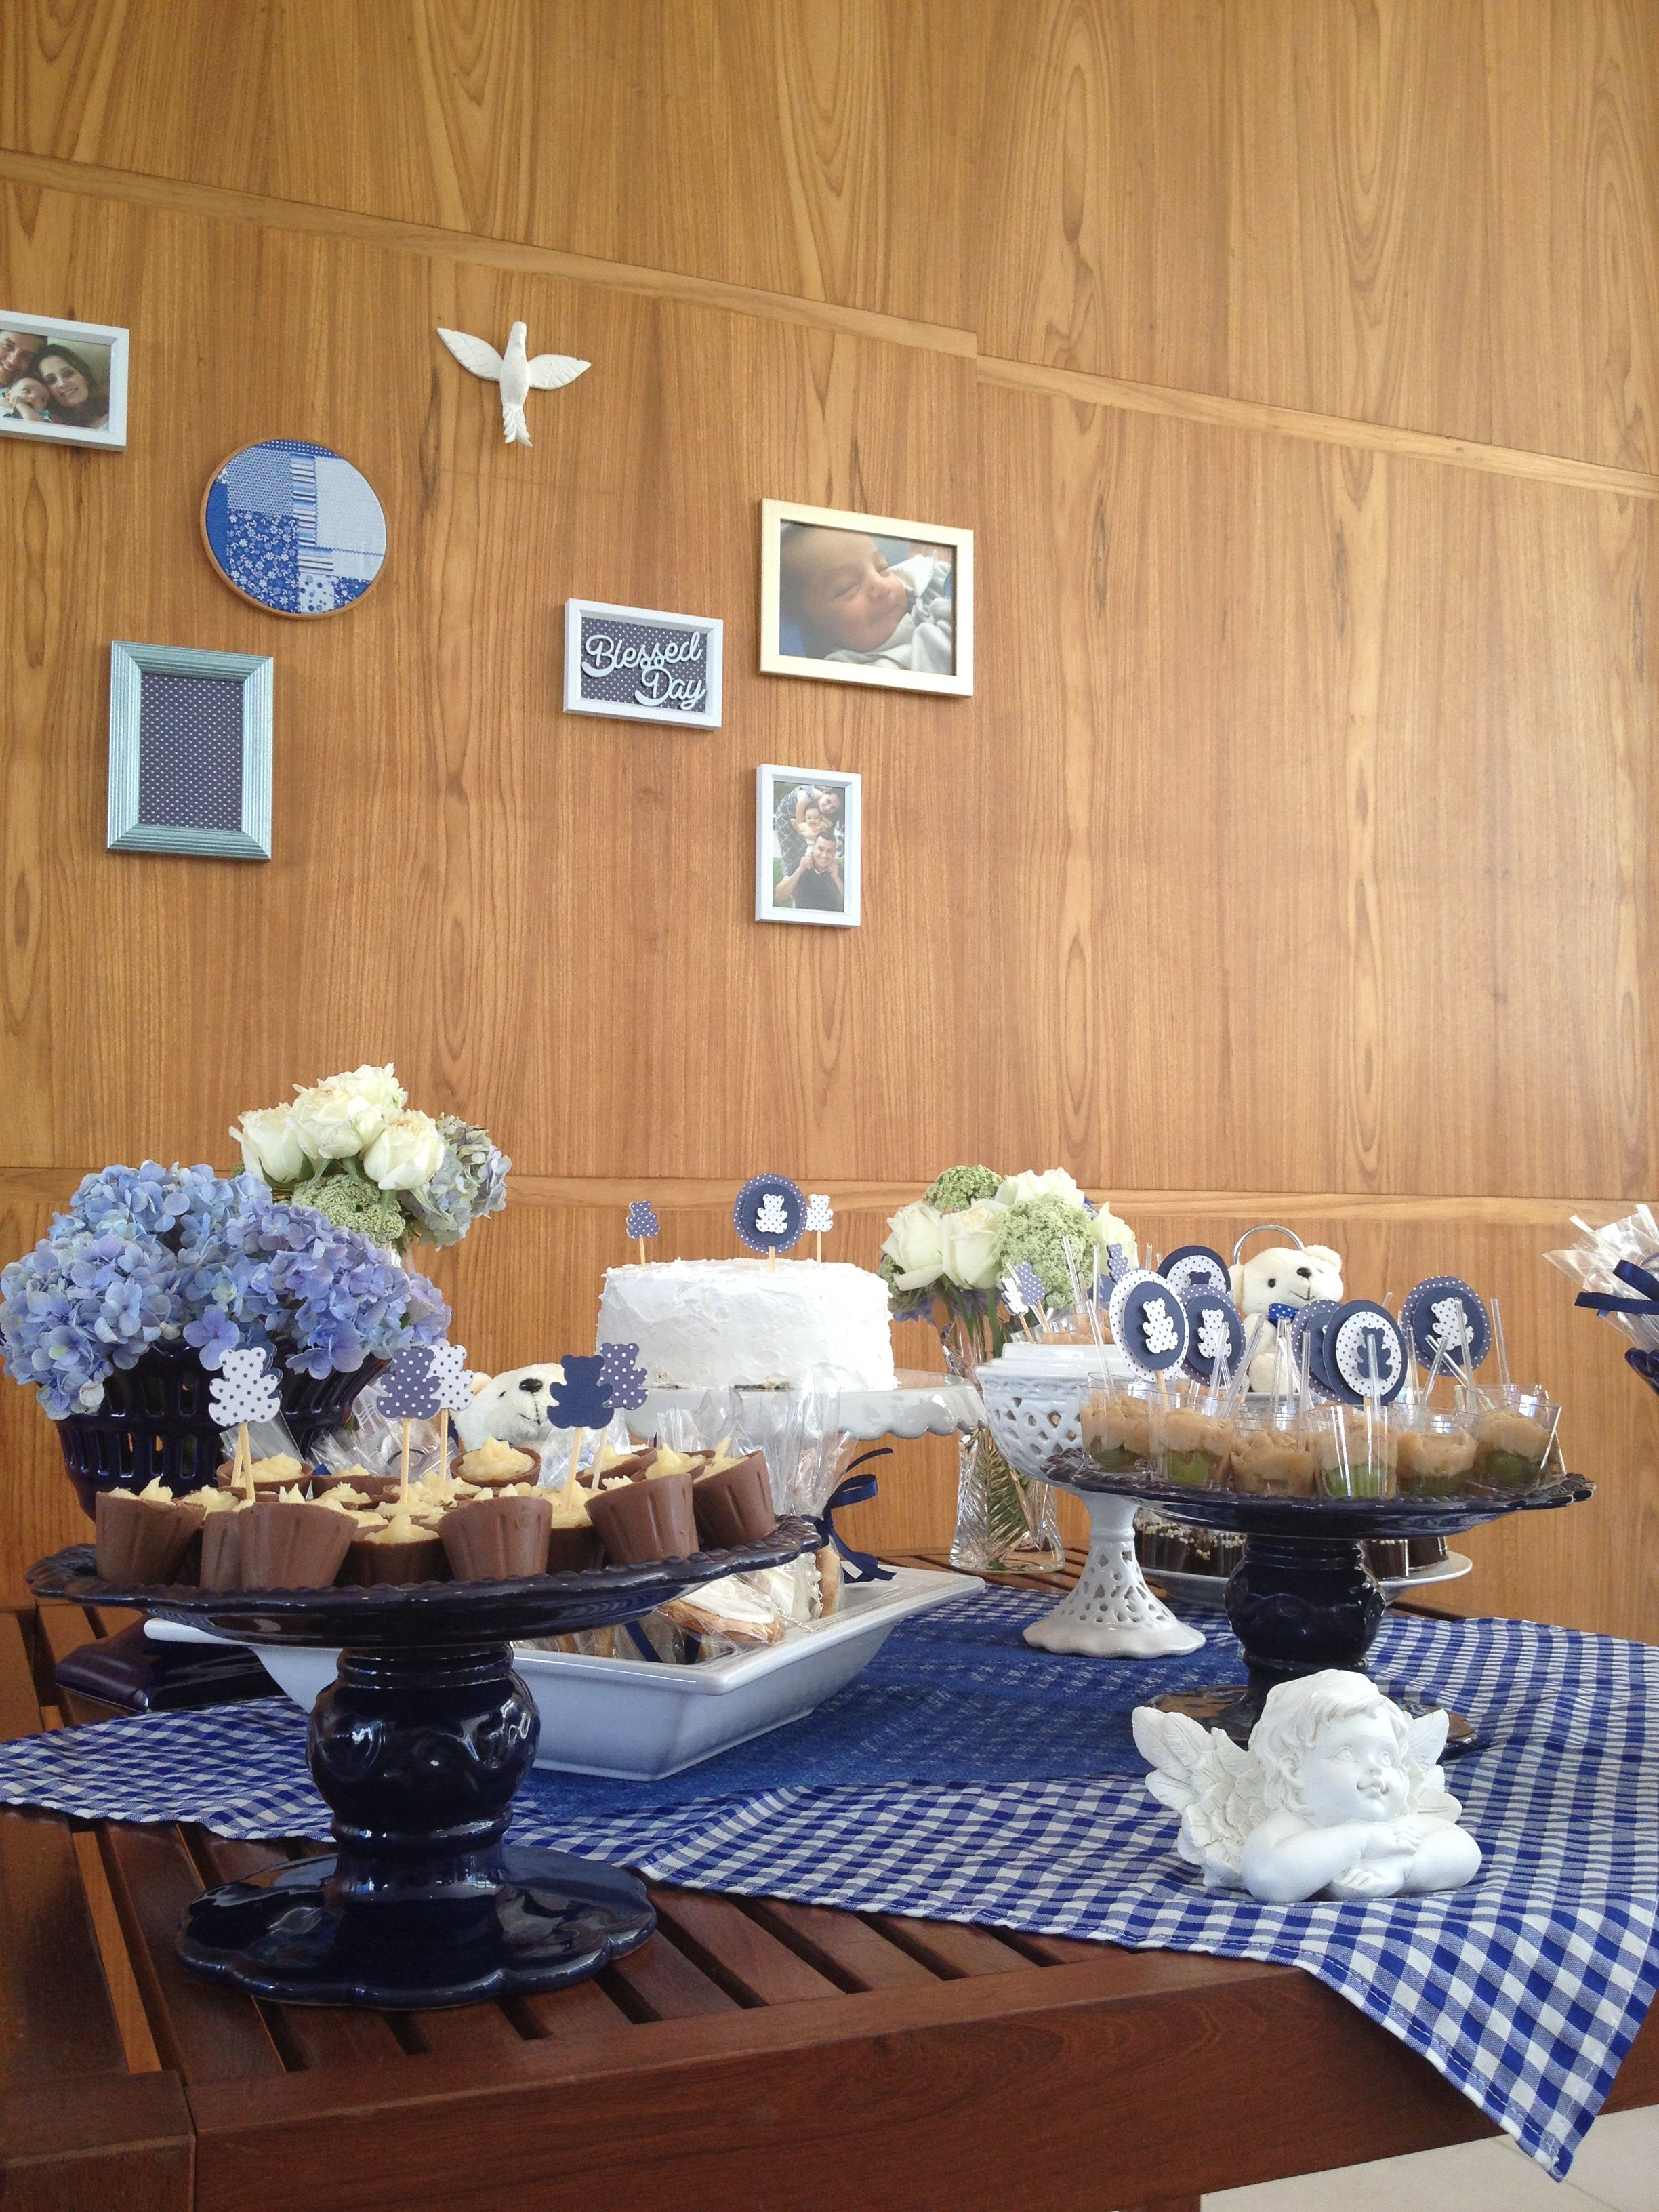 Limoeiro Decor Batizado, azul e branco, anjo, flores brancas